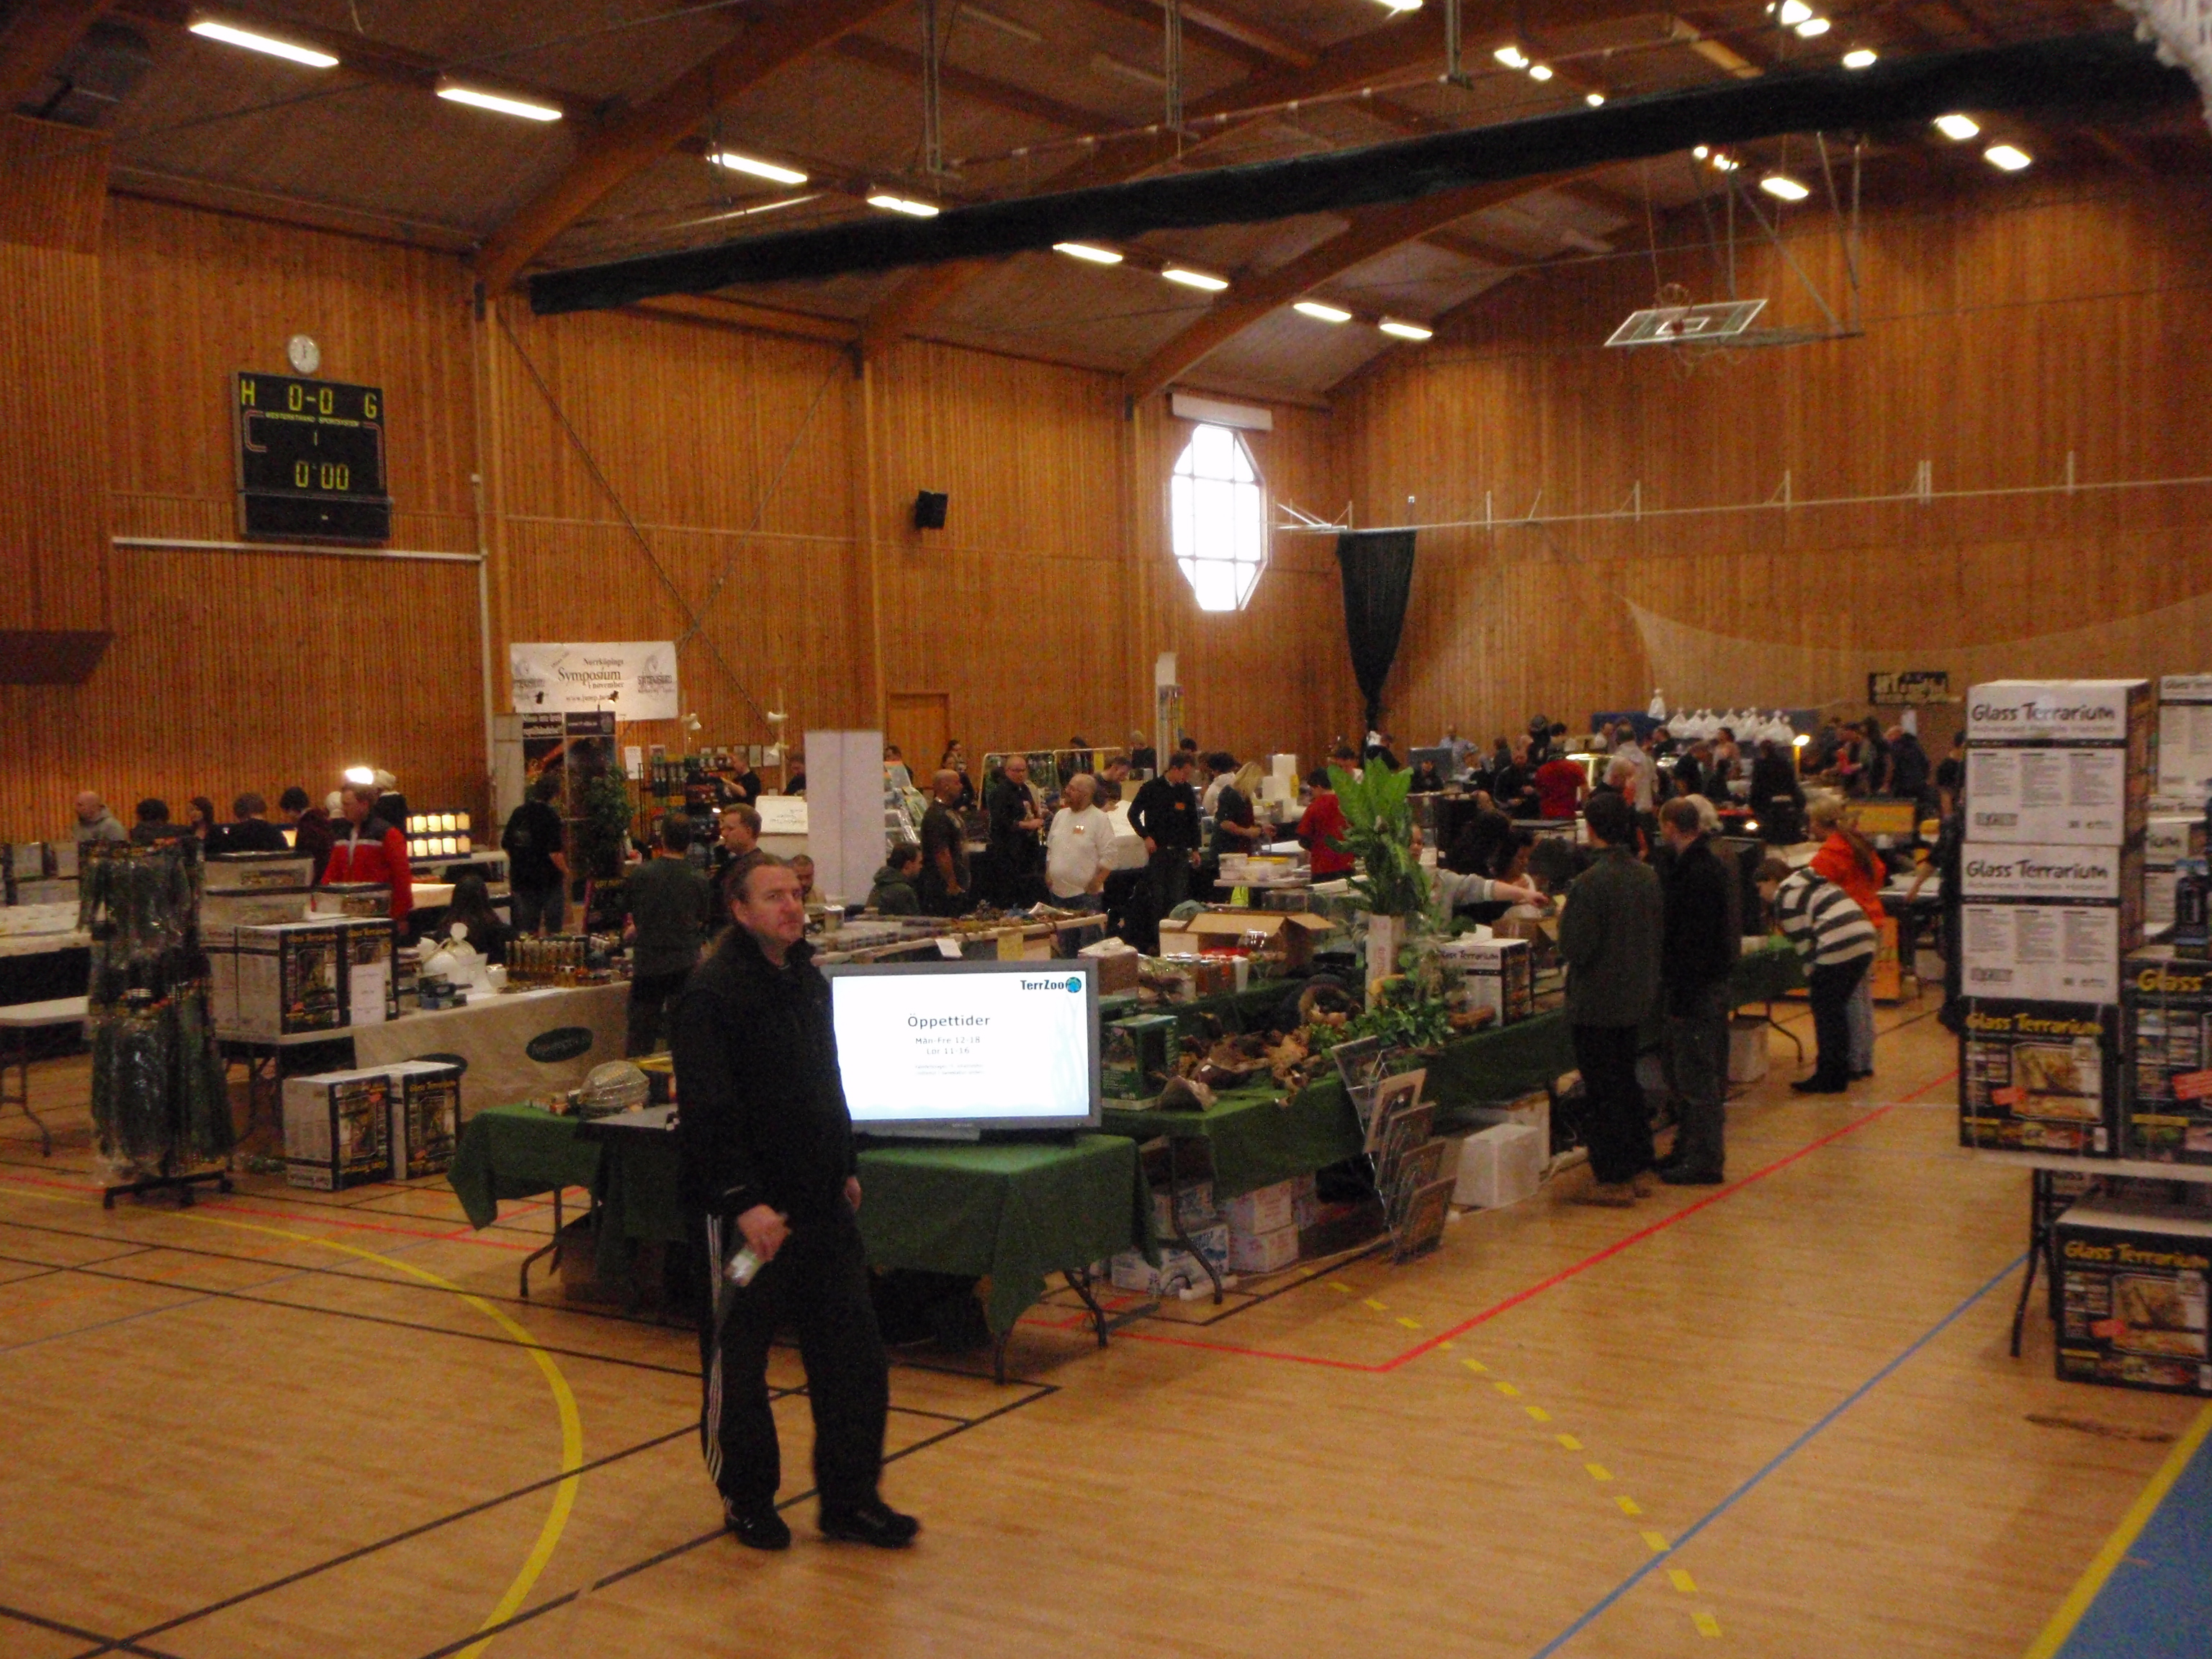 Expo Stockholm 2010